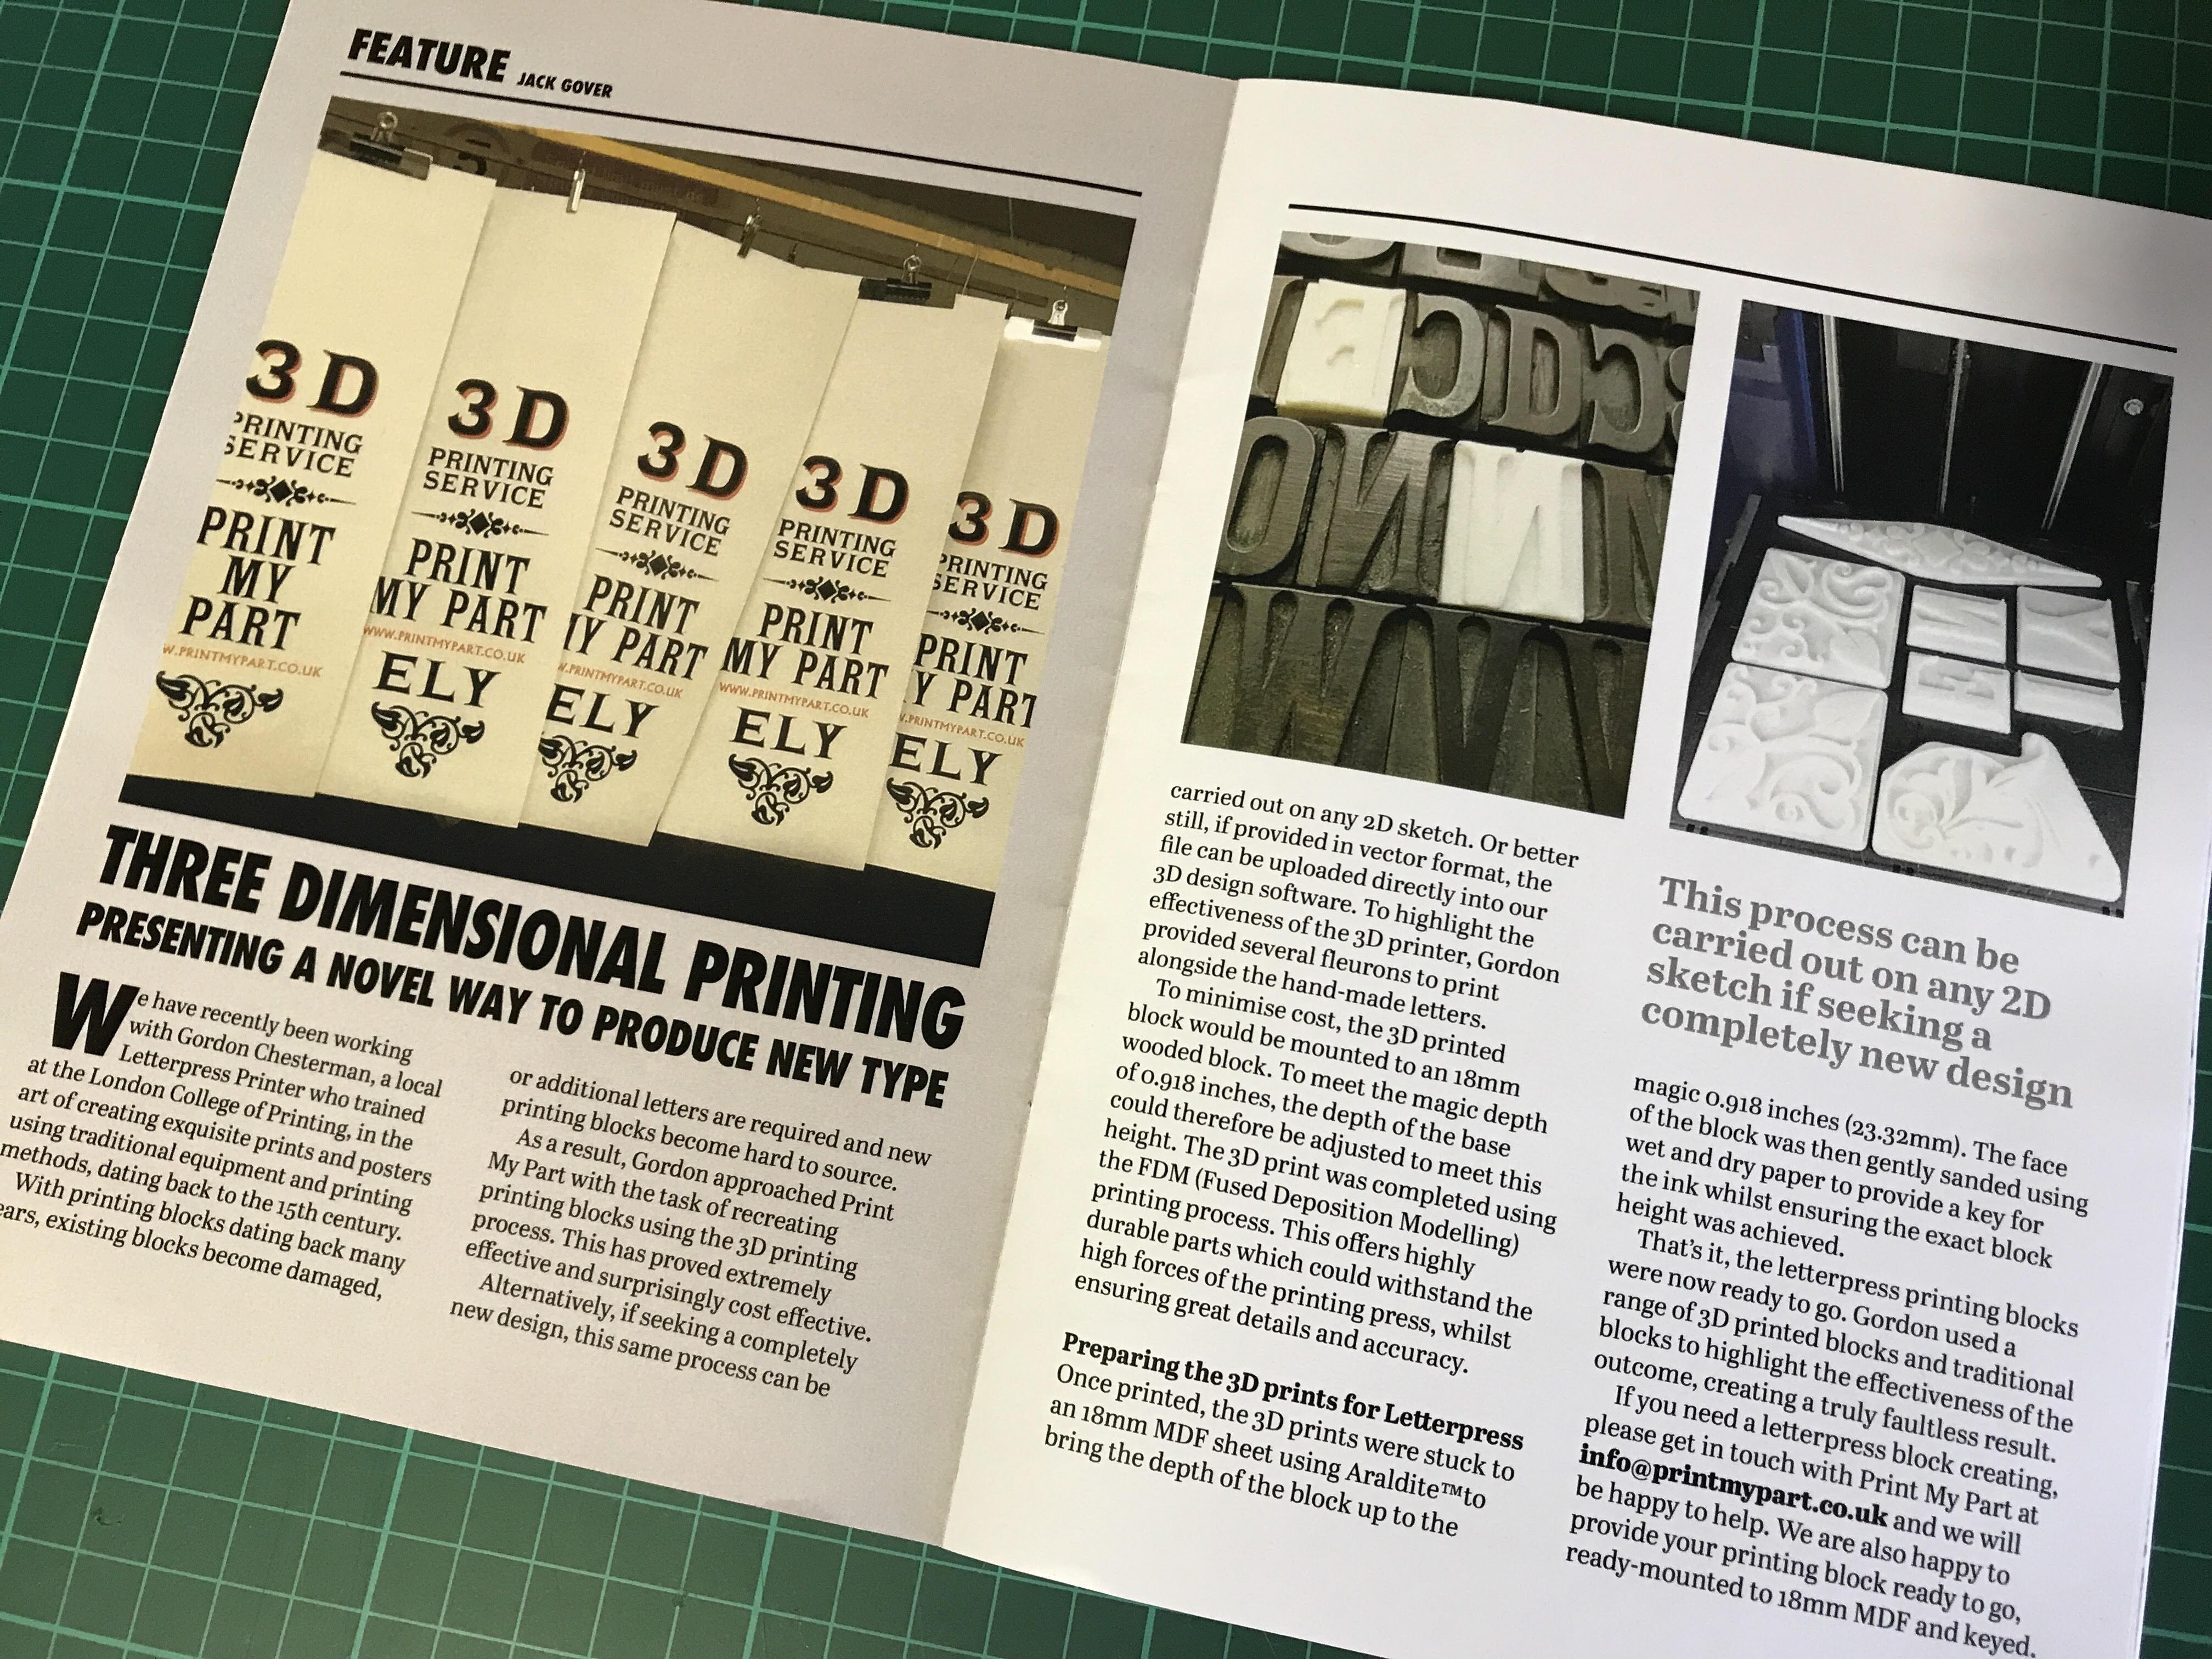 In The Press Small Printer Magazine 3D Printing Letterpress Blocks